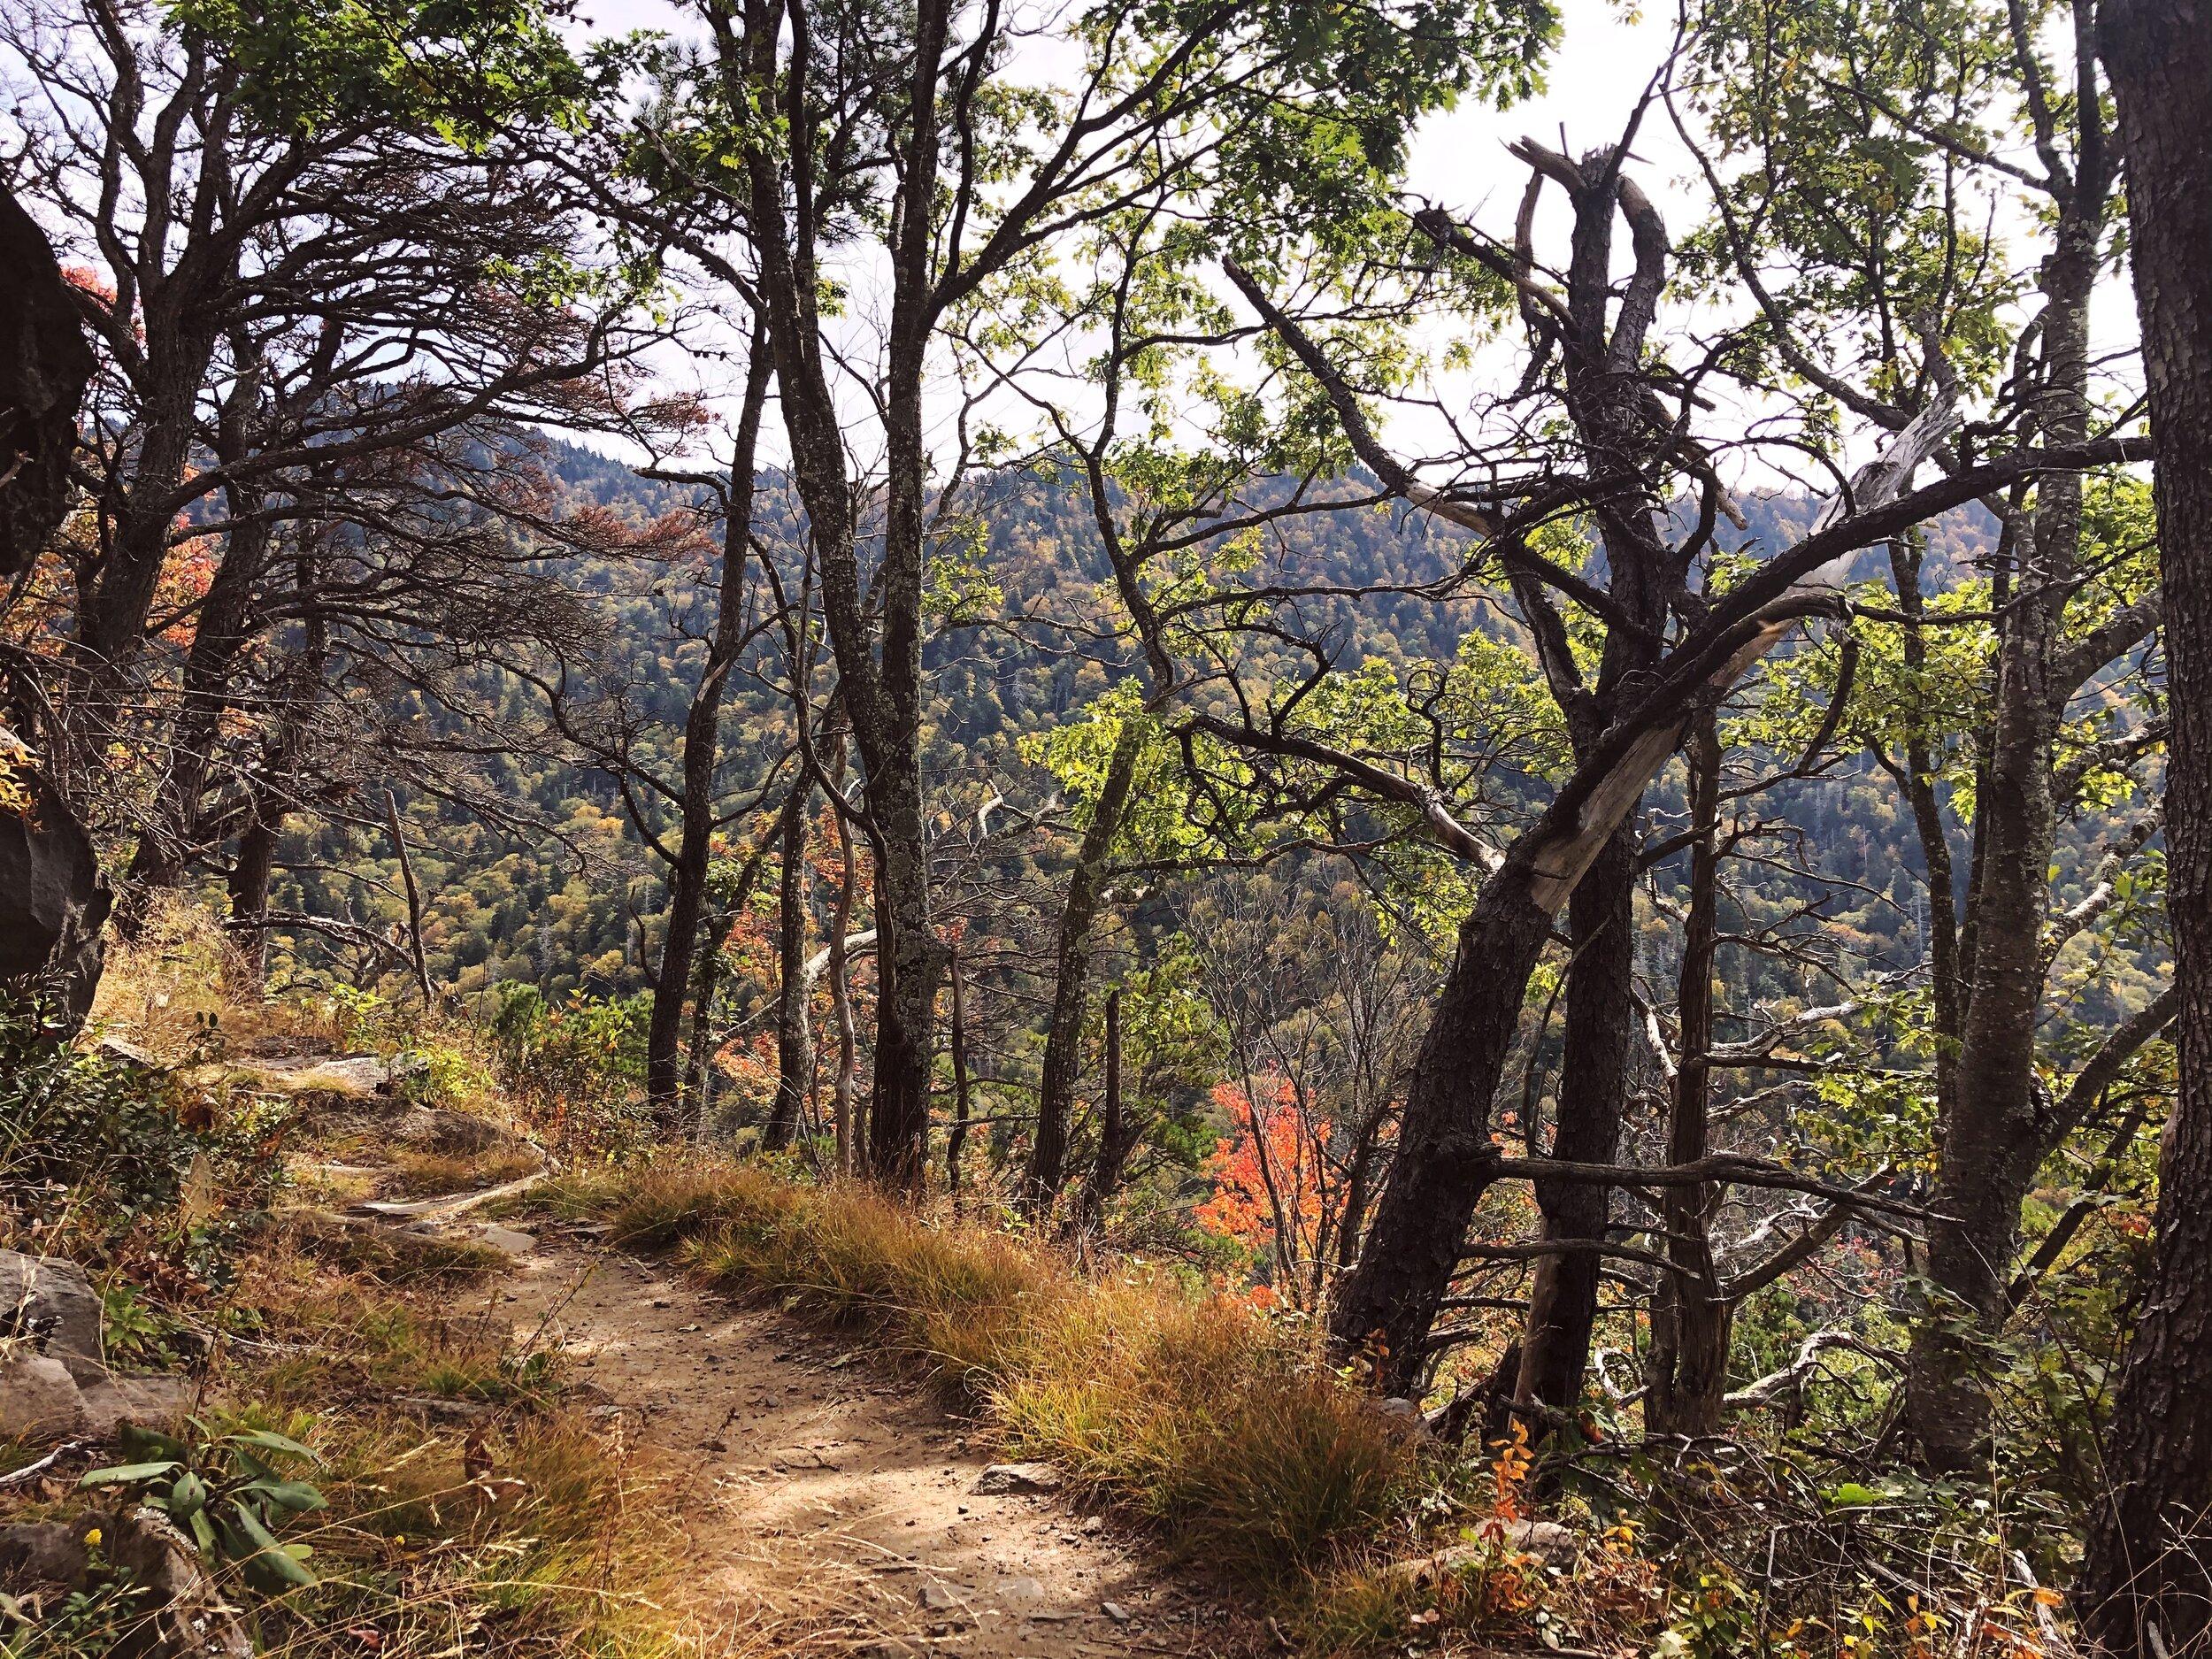 mount-leconte-rainbow falls trail-great-smoky-mountains-gatlinberg-tennessee0442.JPG